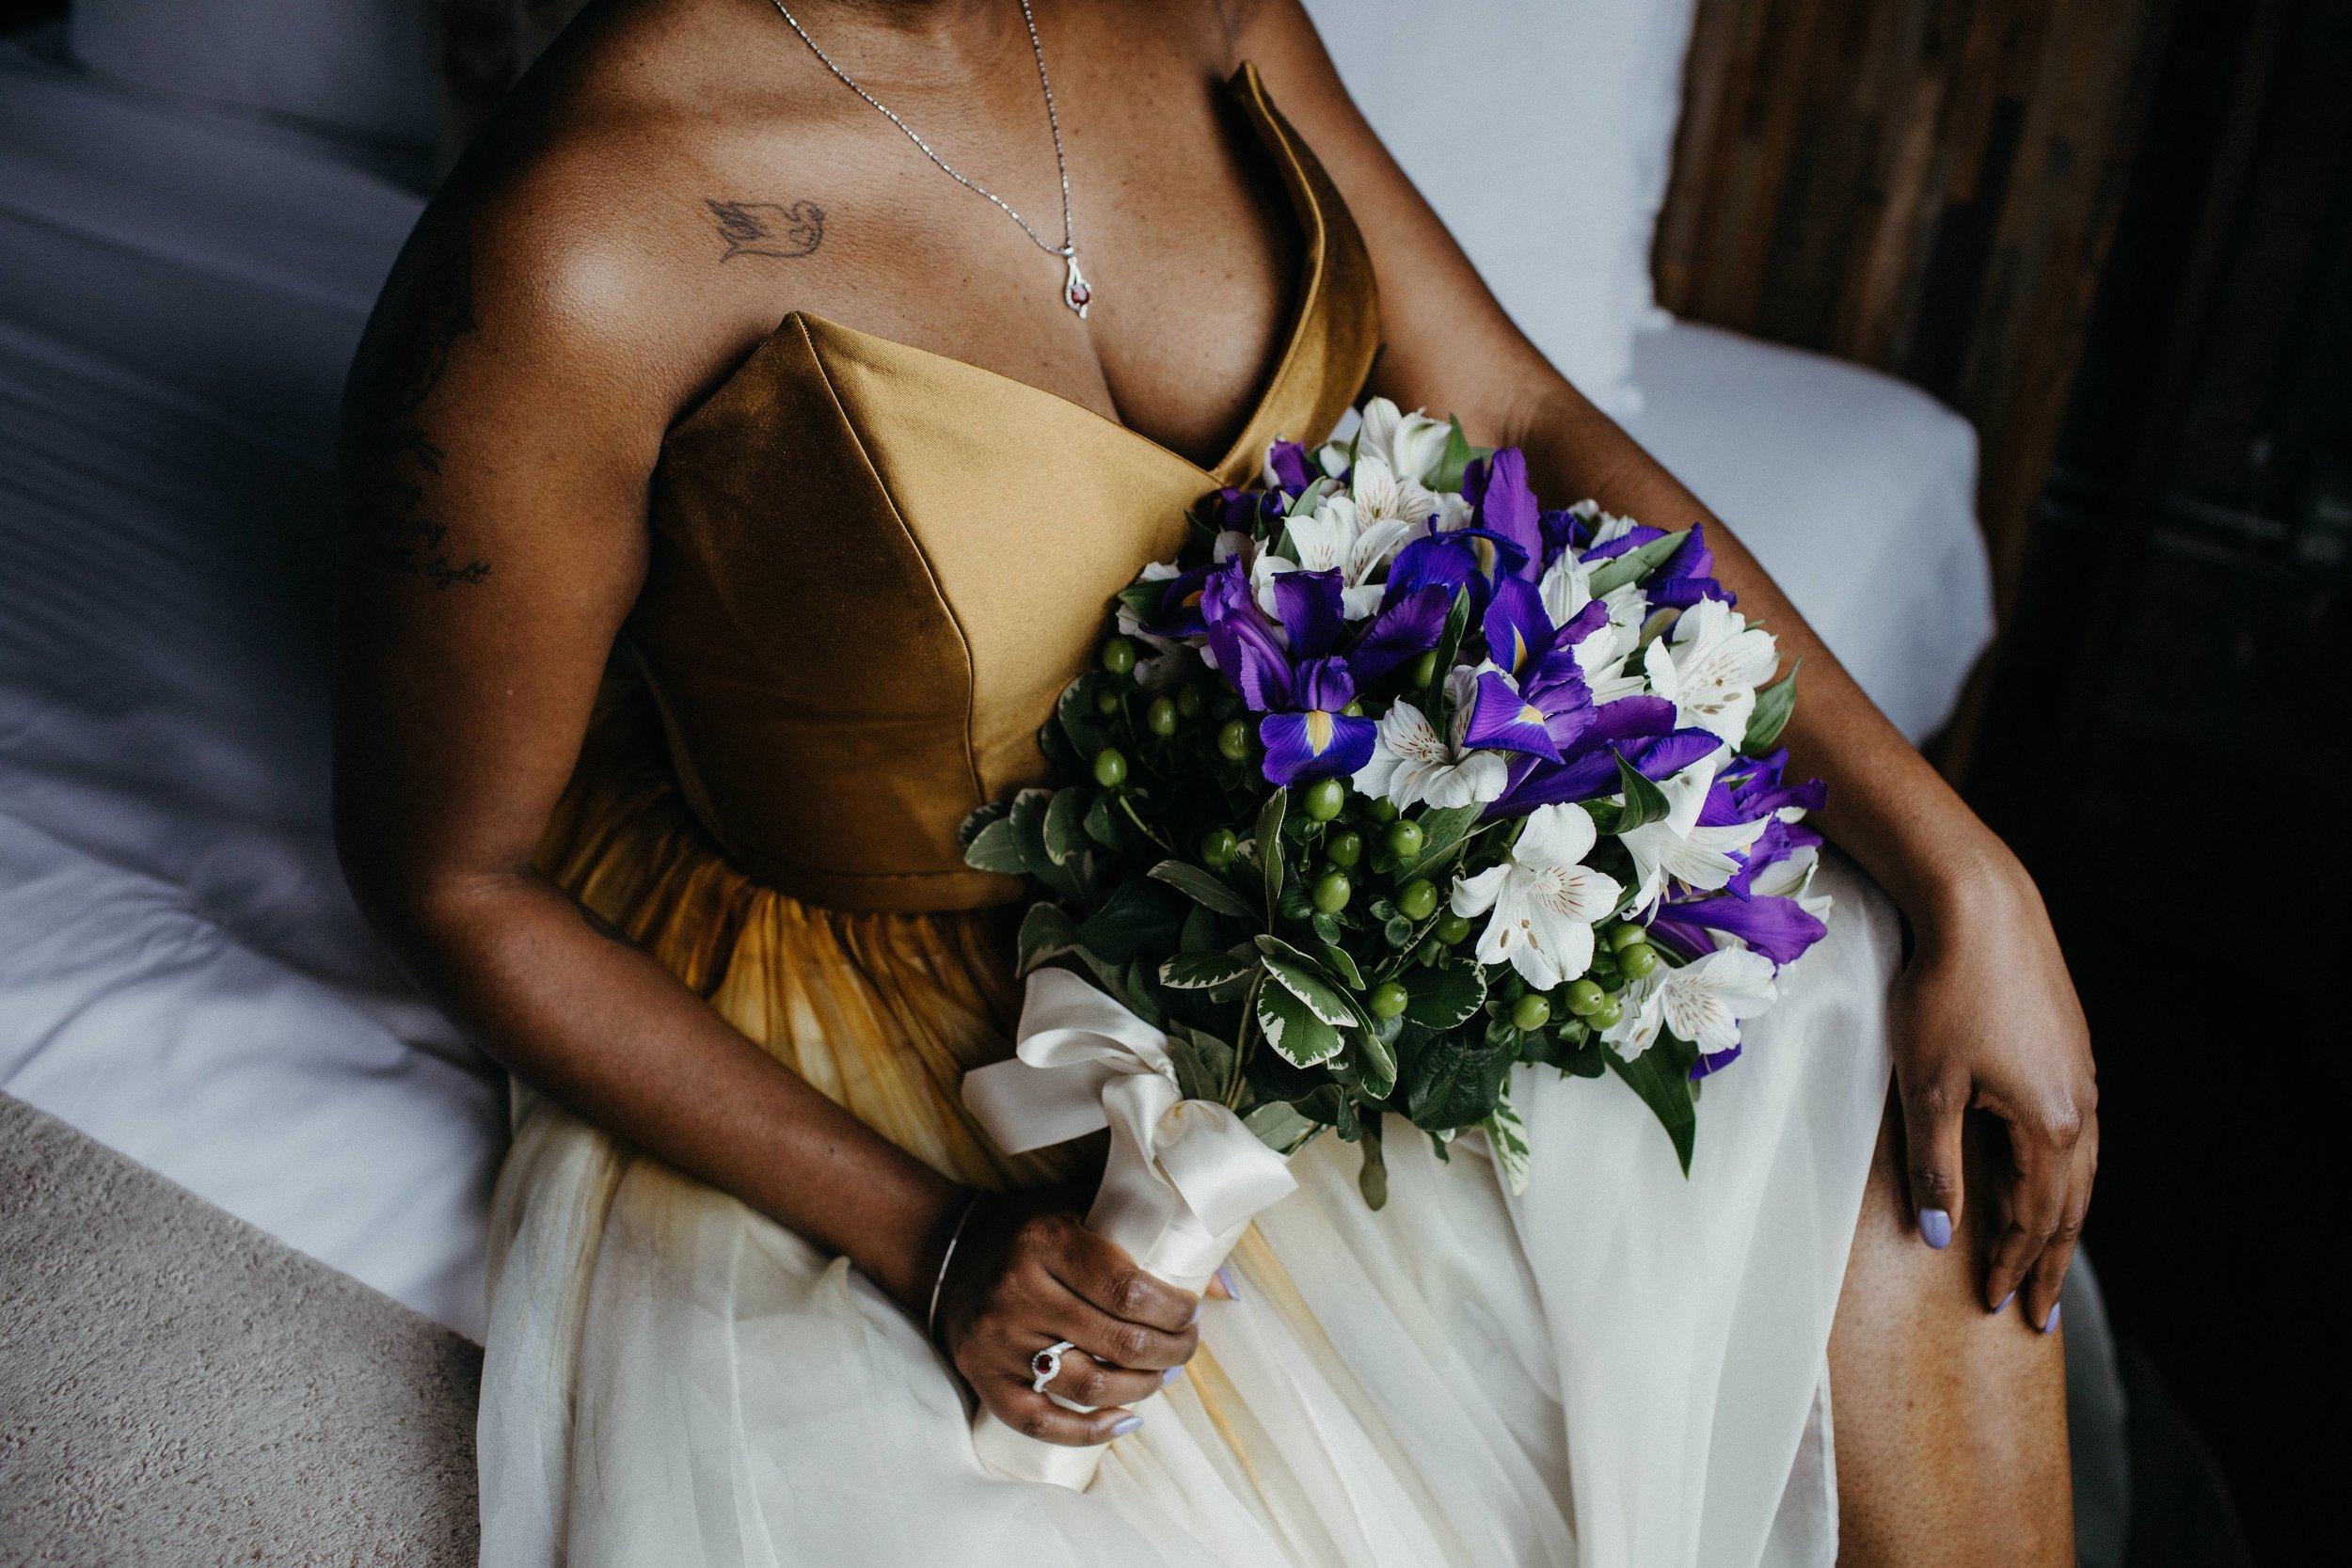 Sevlynn-Photography-Wedding-LIC-Landing-Maiella-NYC-22.jpg